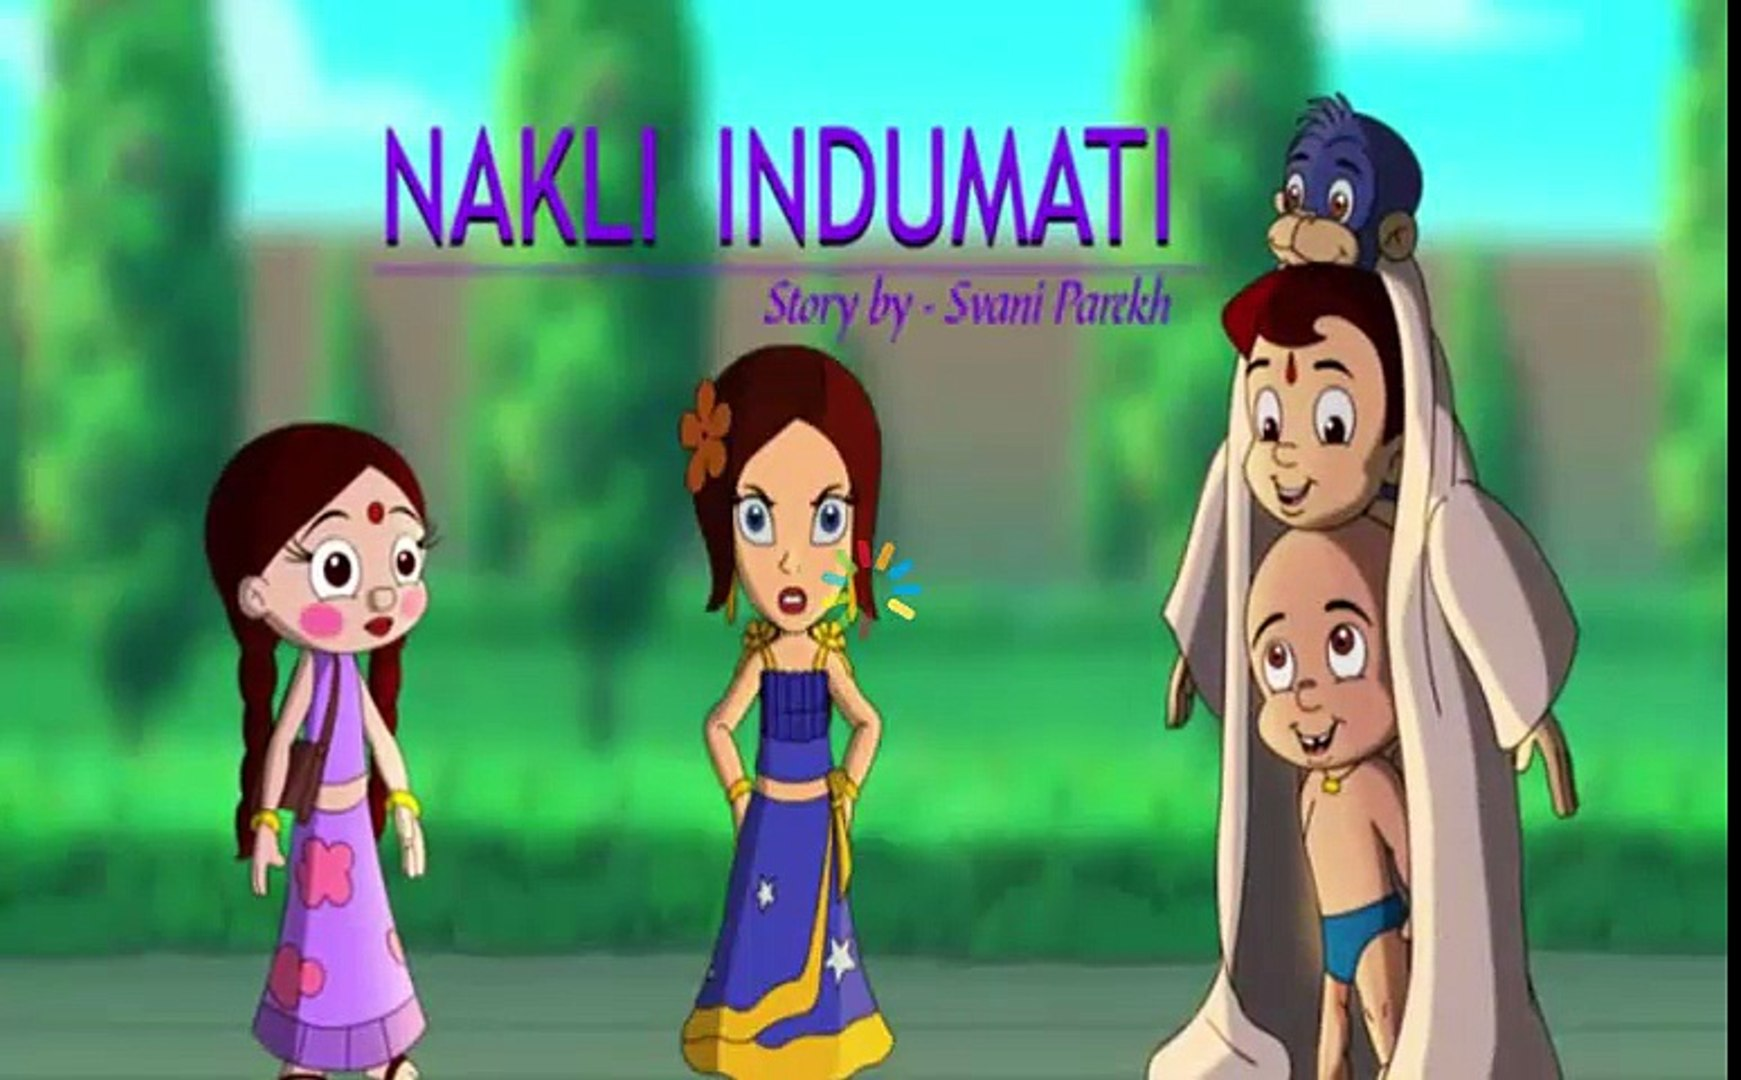 Chota Bheem  Kali Indumati In Hindi Full Episode 2017 NEW